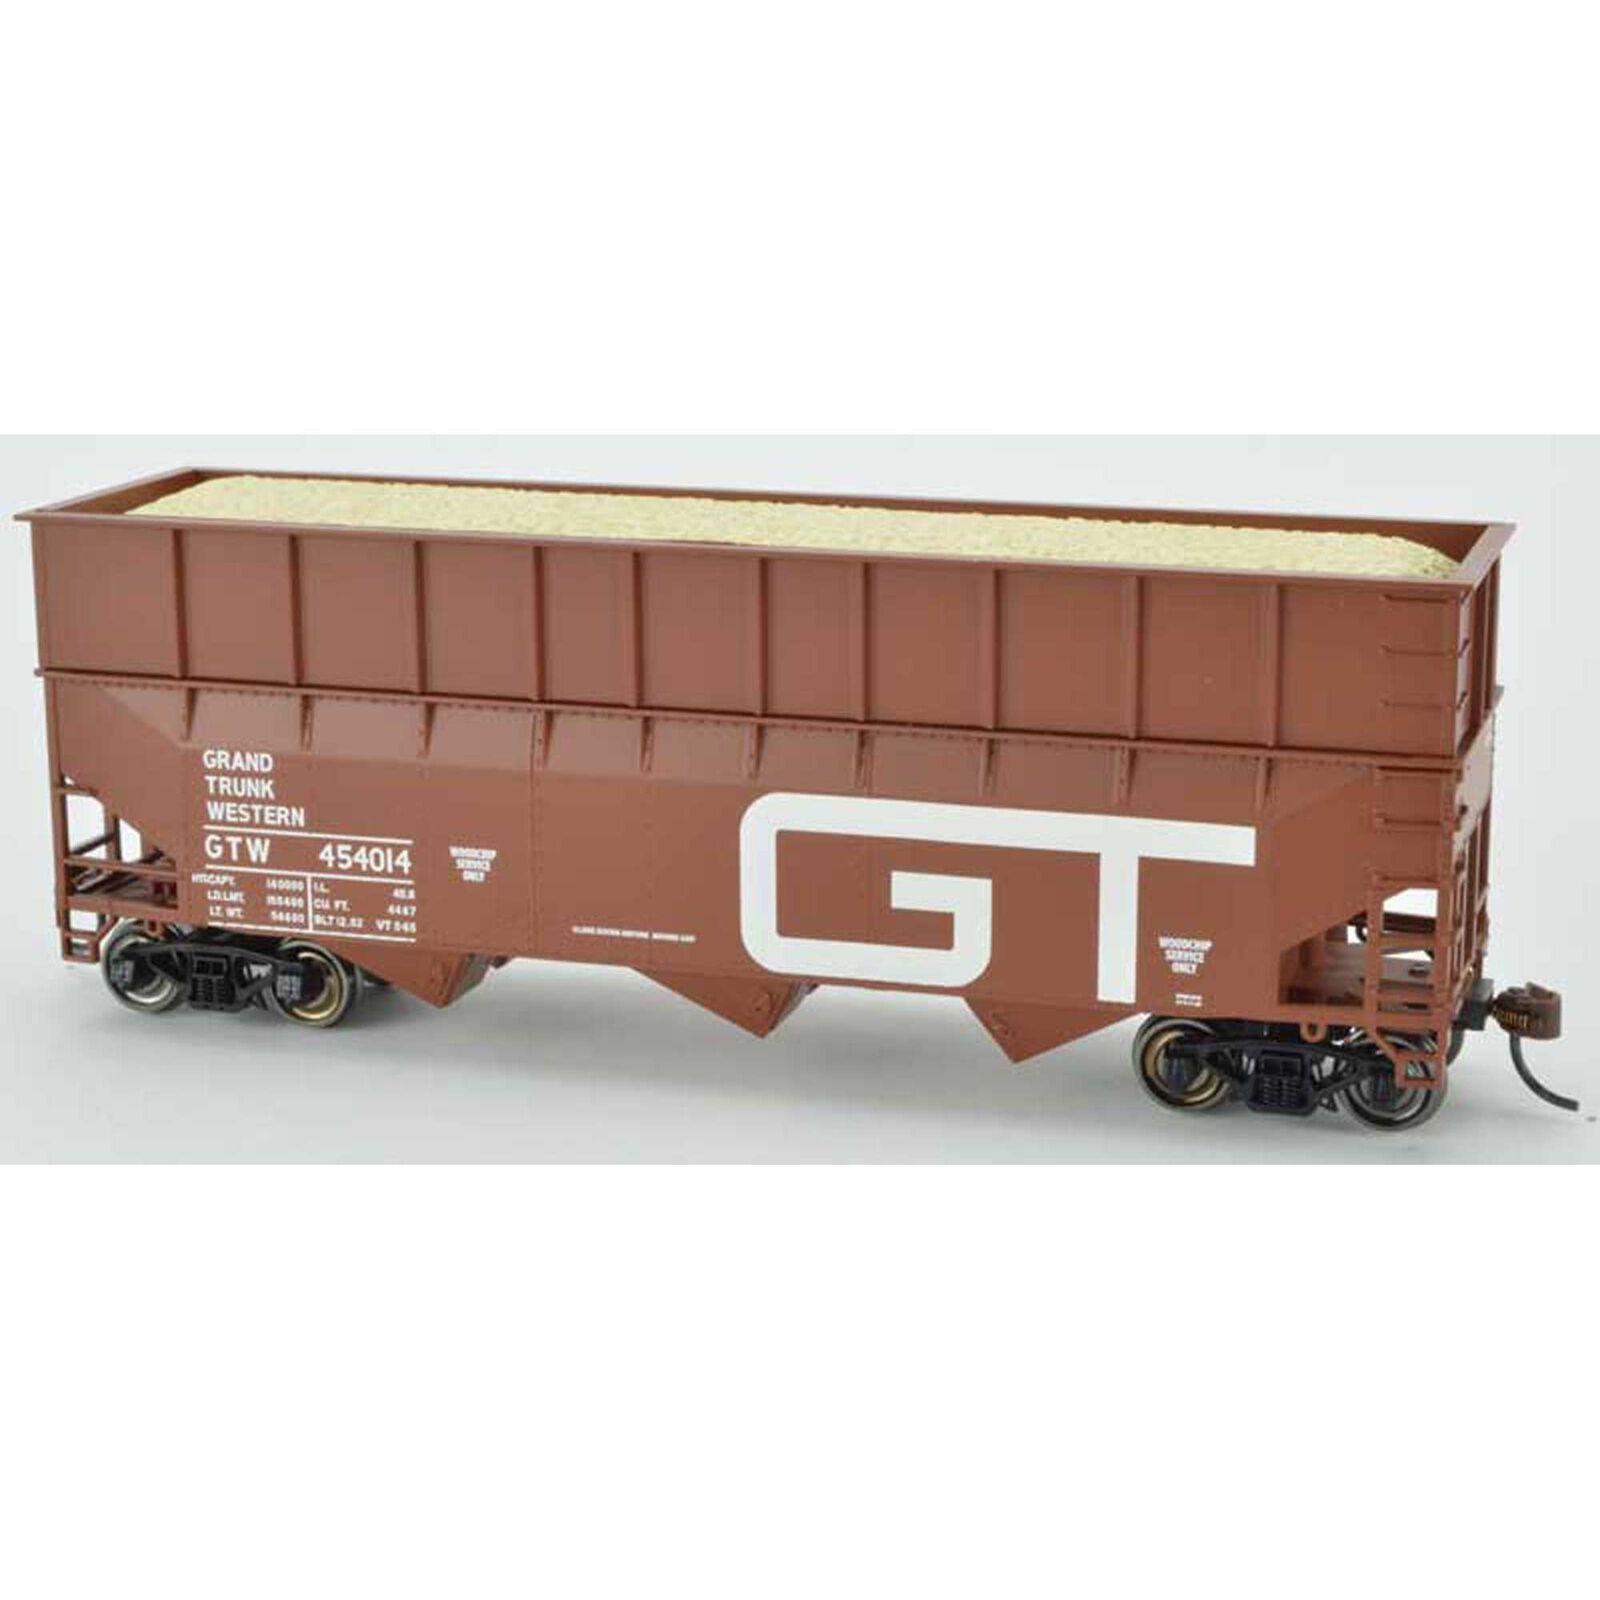 70 Ton Wood Chipper Car Ready to Run HO GTW 454011